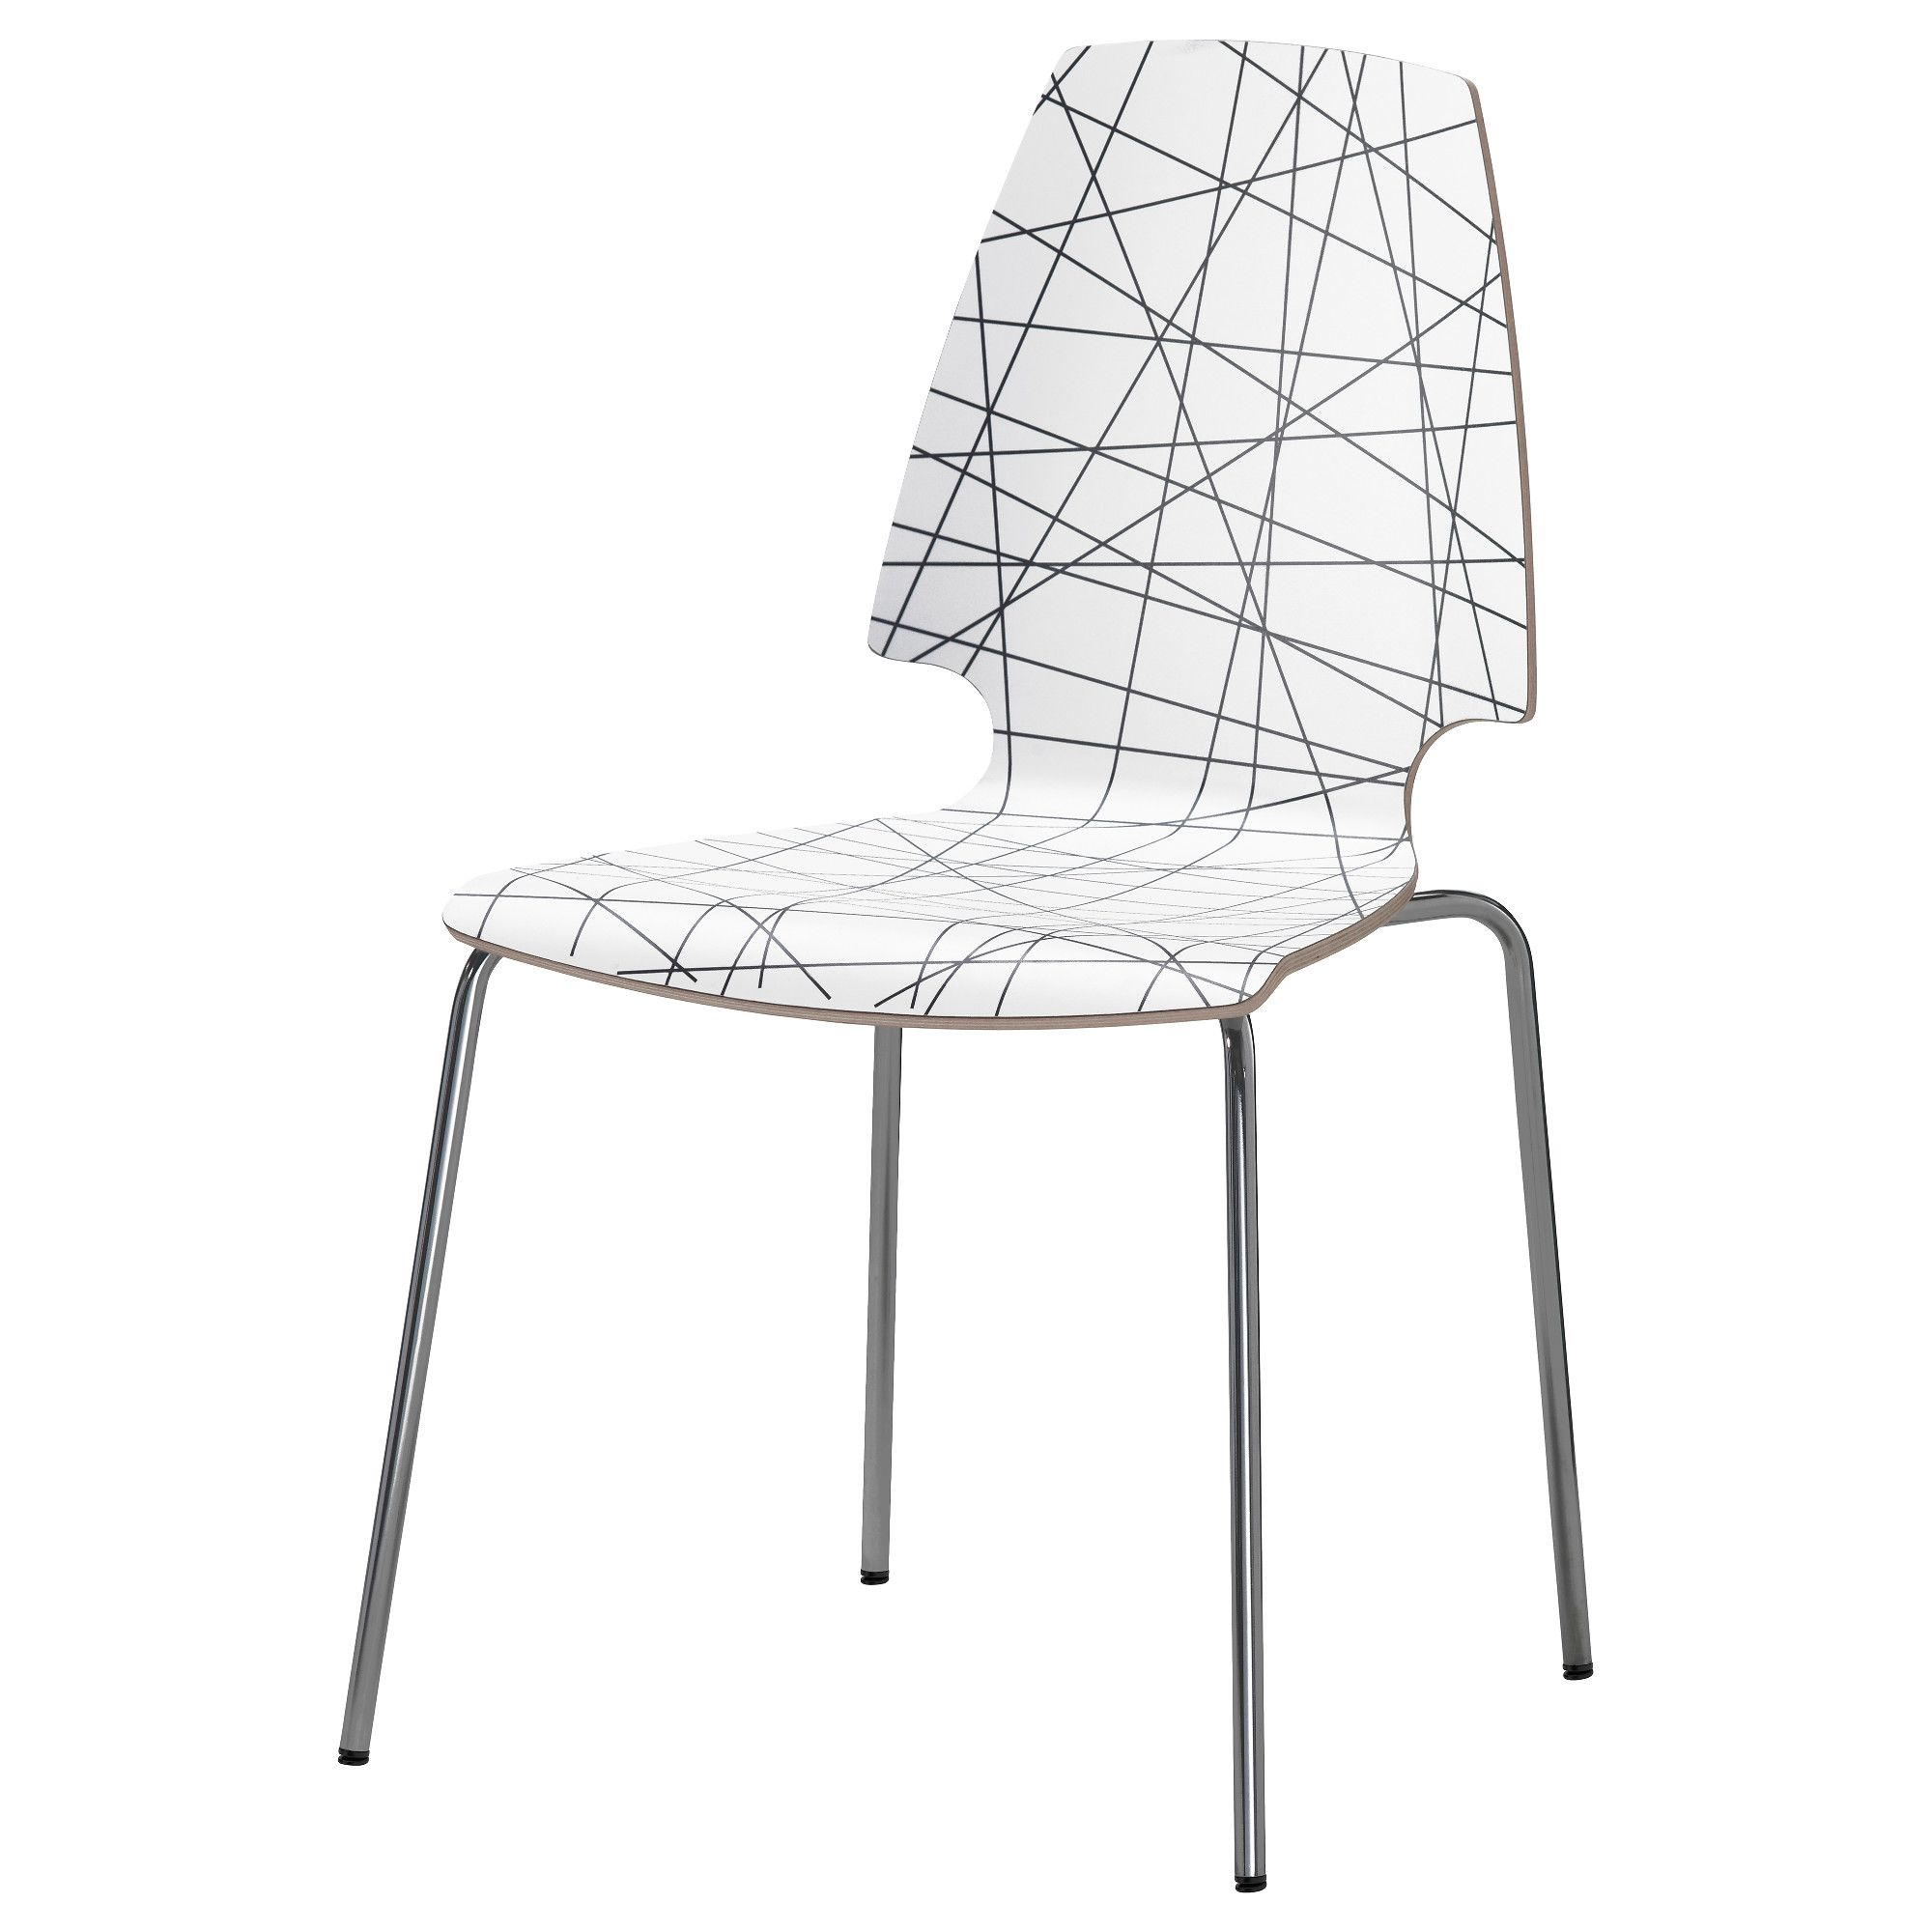 US Furniture and Home Furnishings | Ikea dining, Ikea